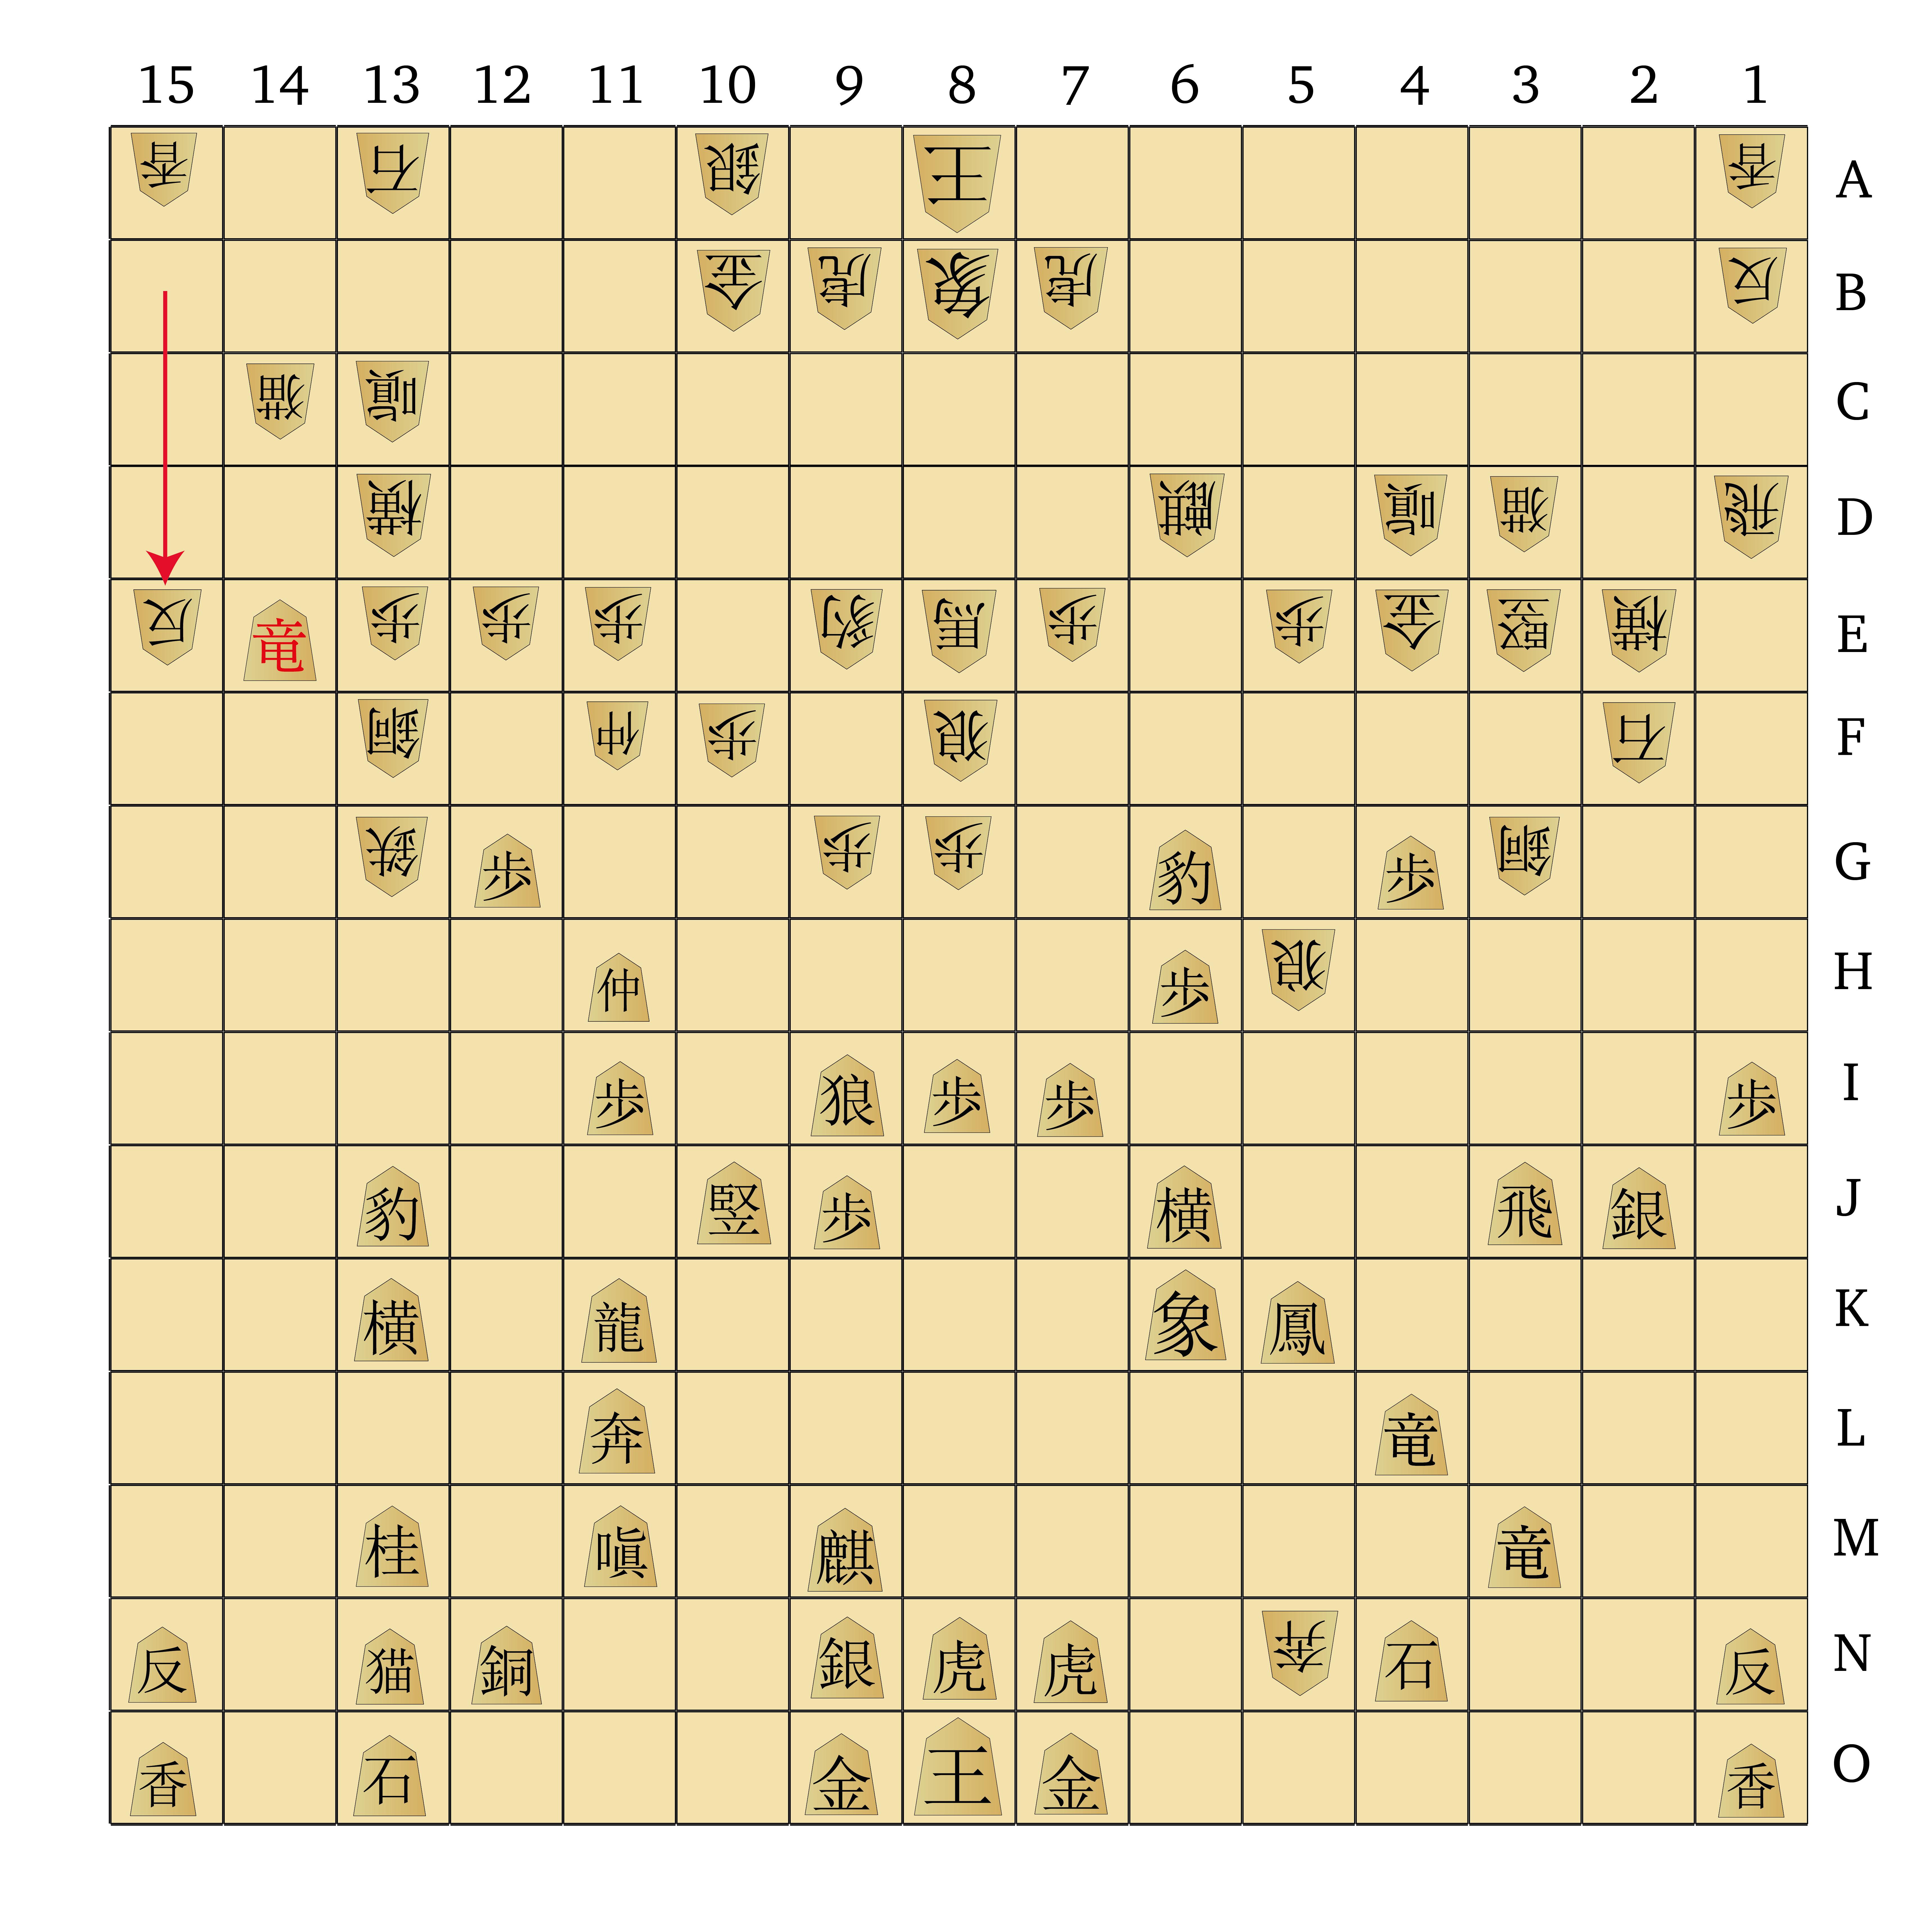 Dai Shogi 420 -- Move 340-01